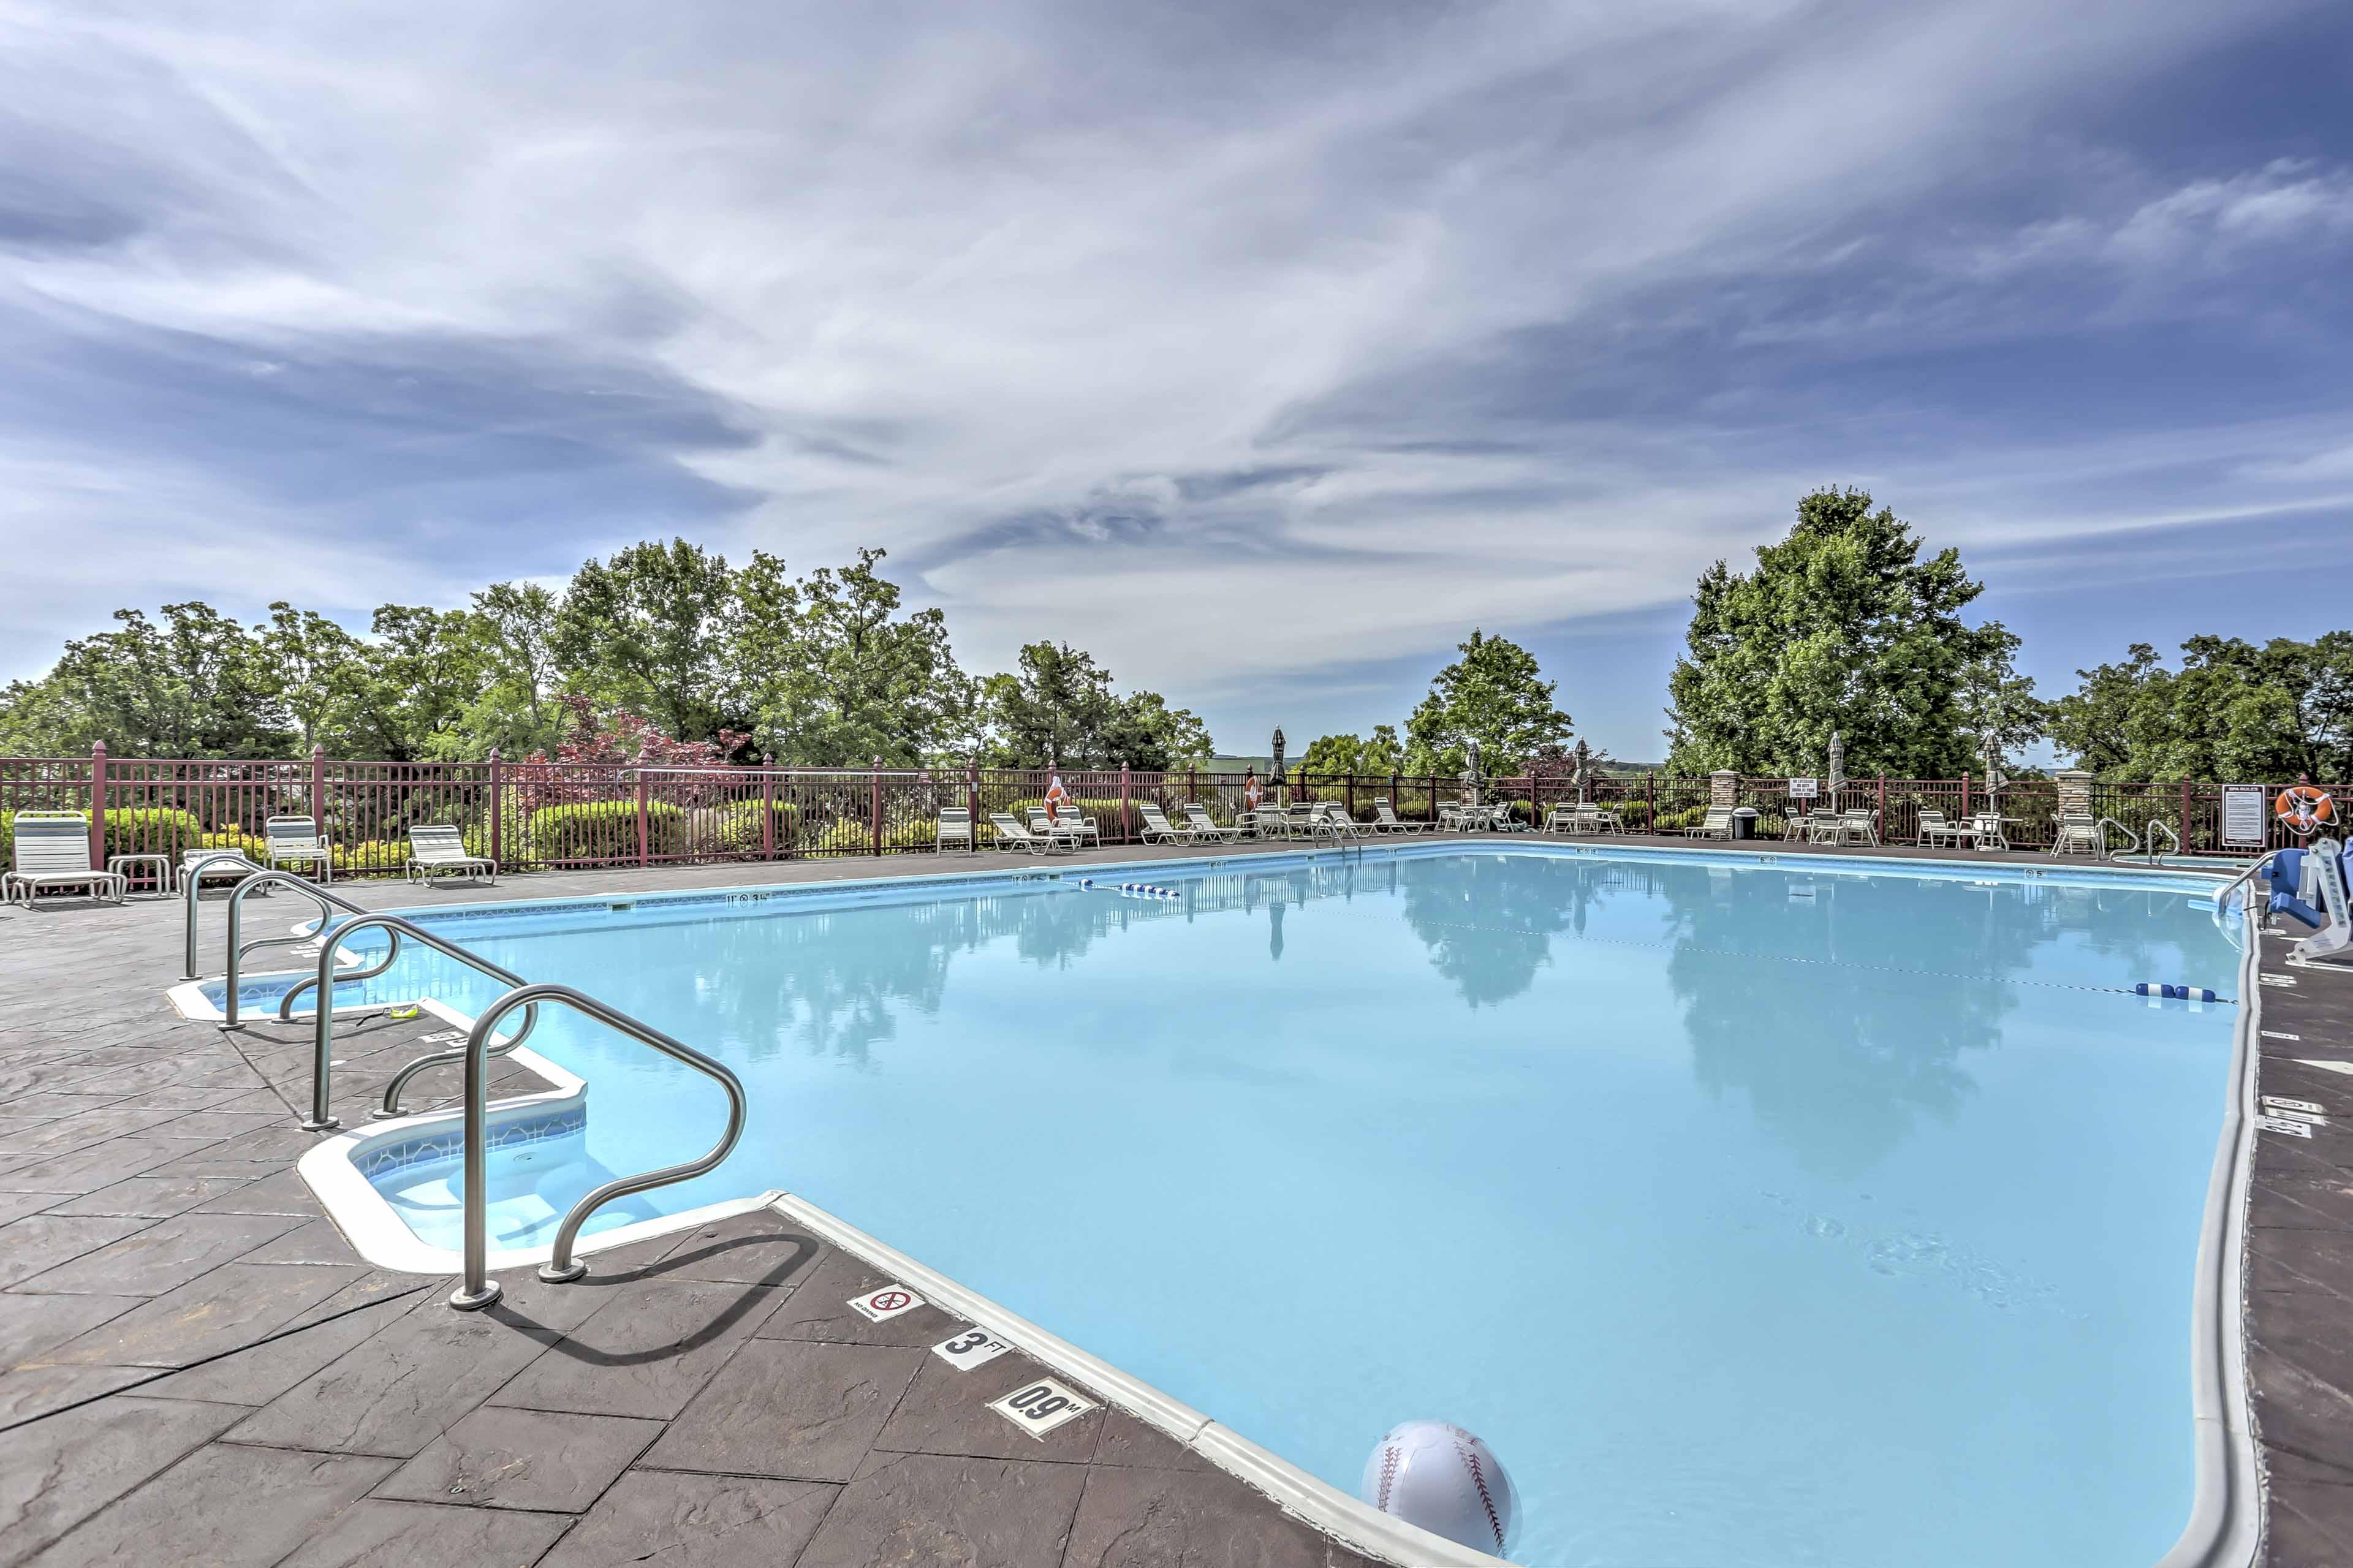 Swim laps in the outdoor pools.